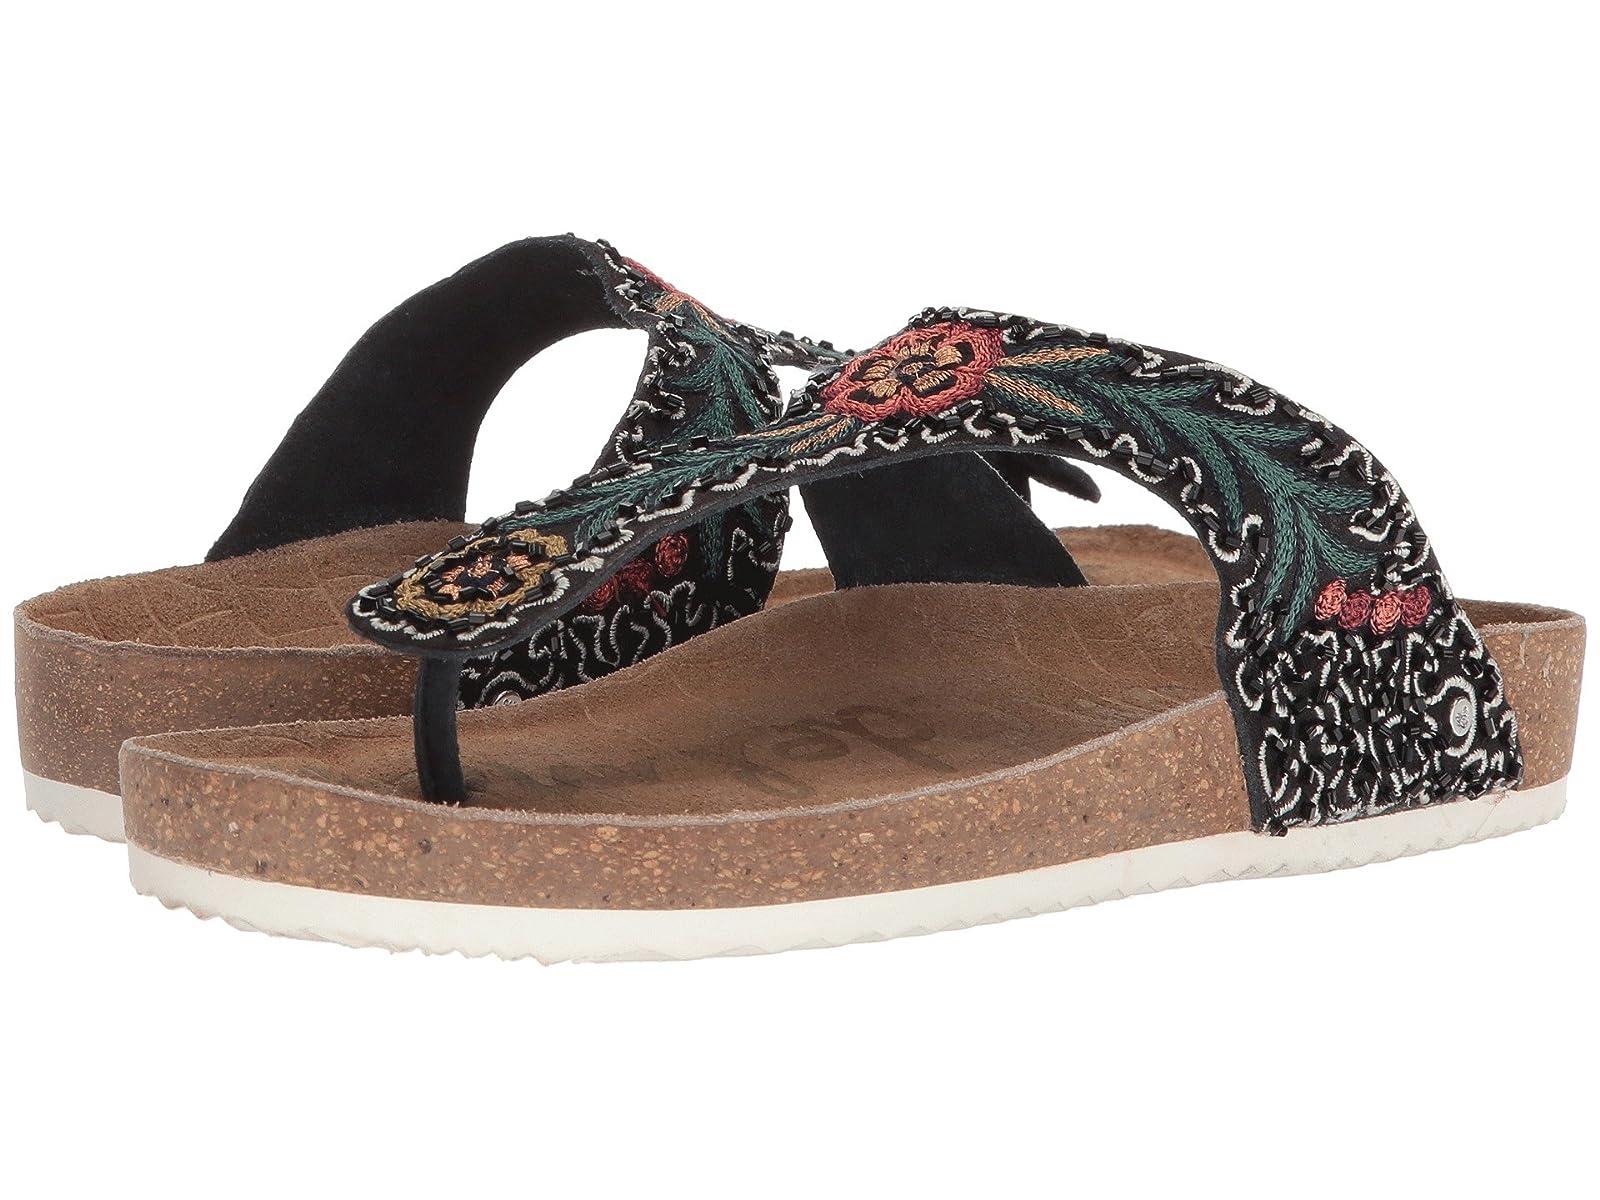 Sam Edelman Olivie 3Cheap and distinctive eye-catching shoes